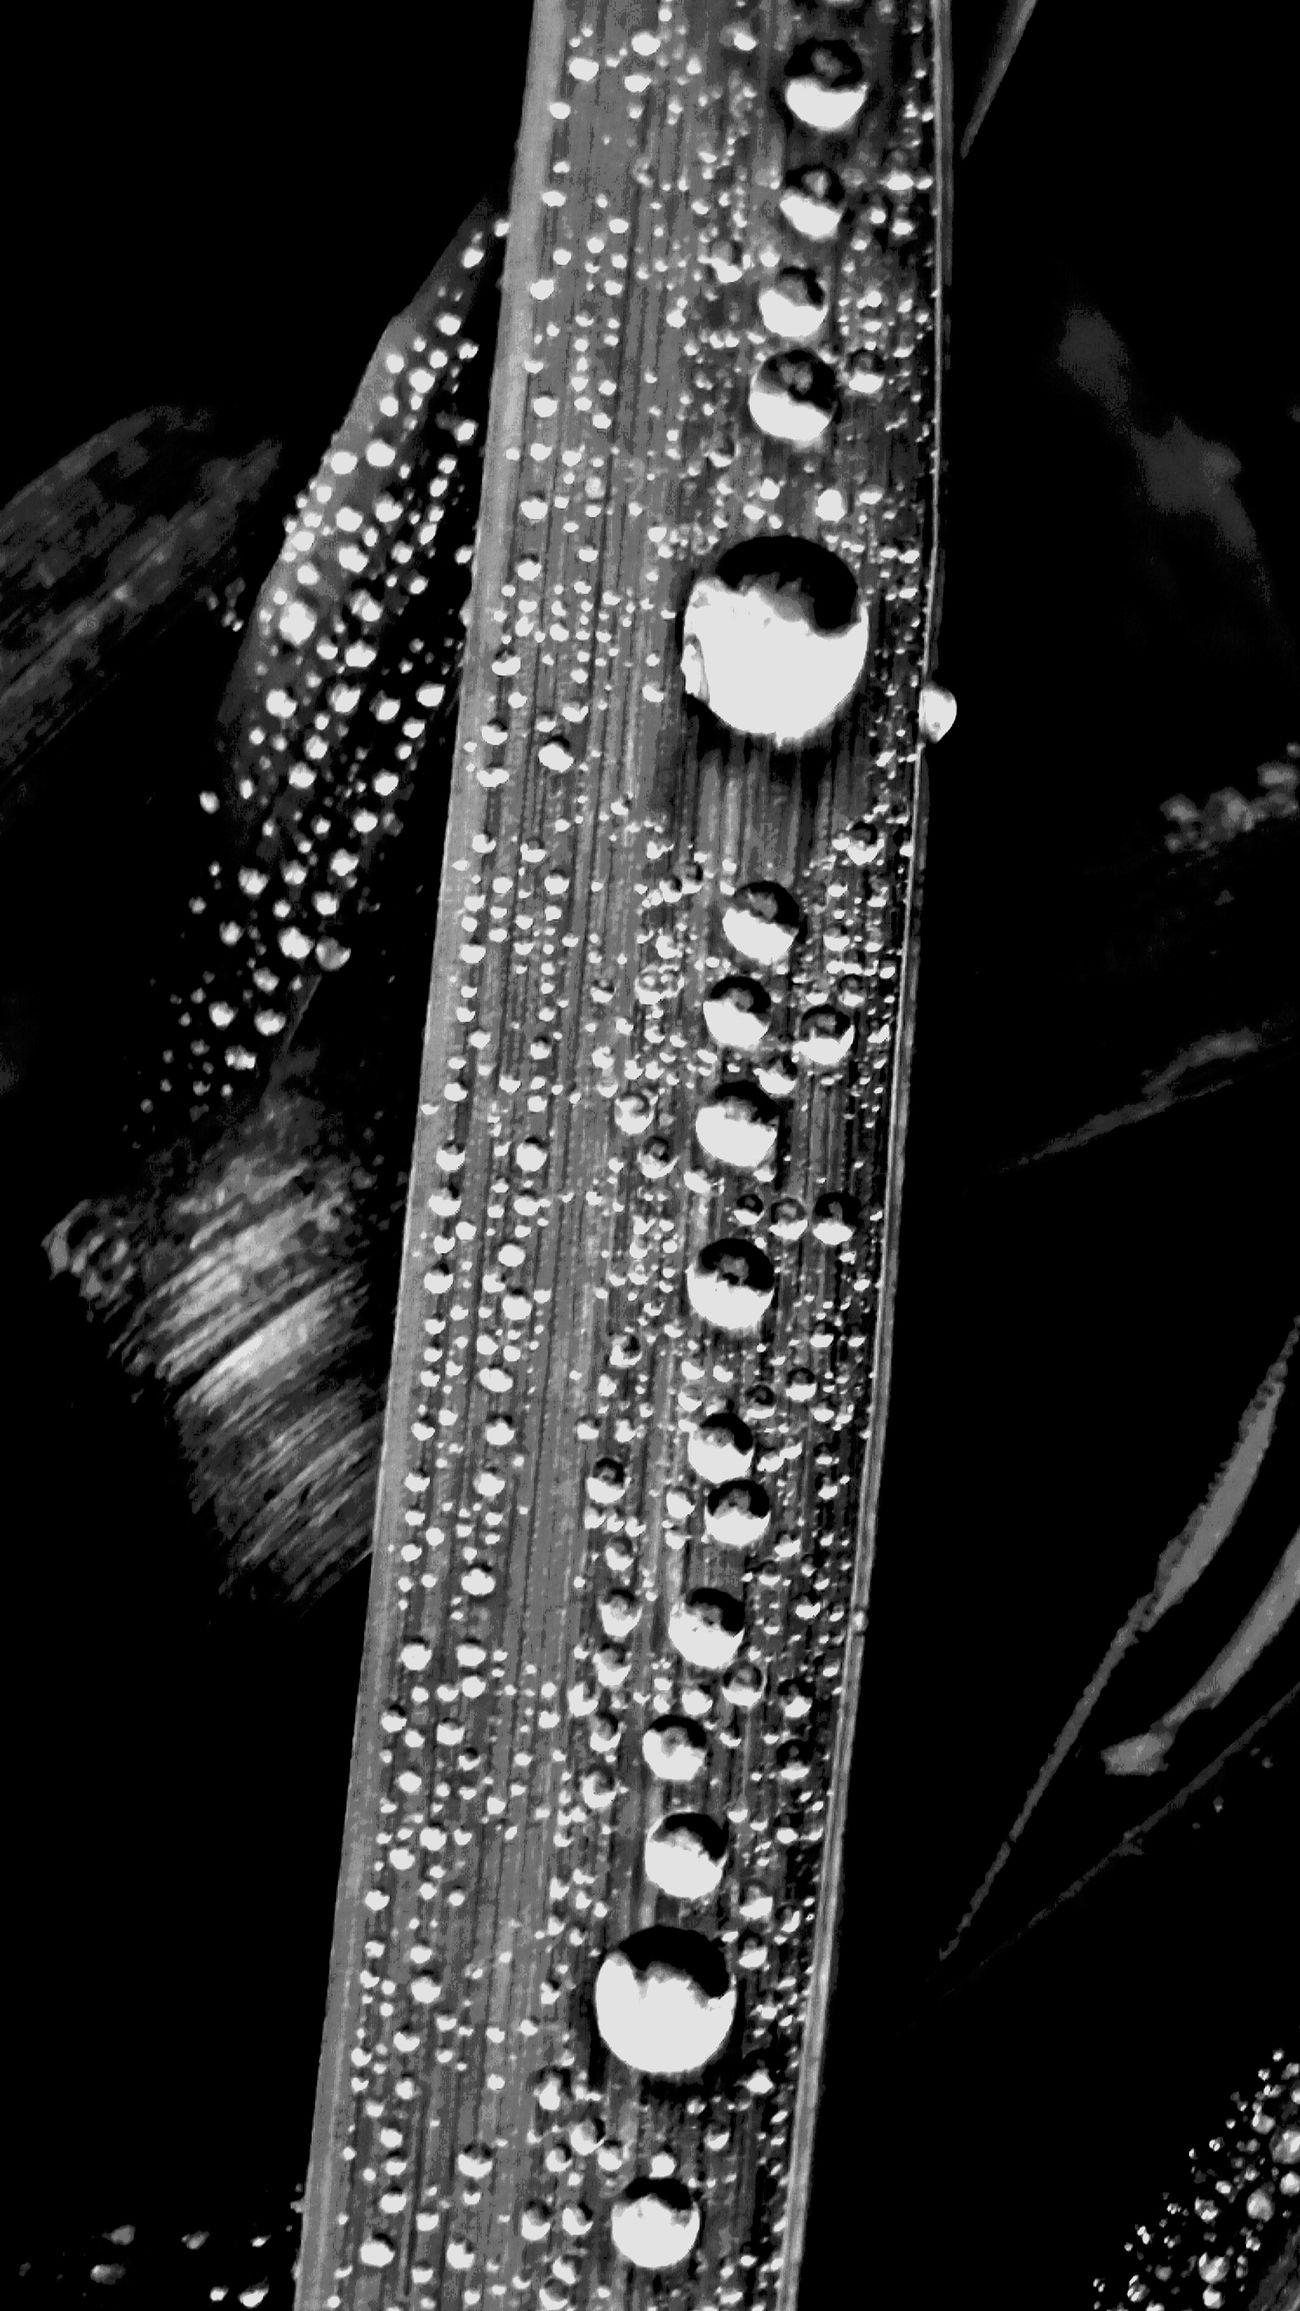 Blackandwhite Photography Blancoynegro Black And White Collection  Blackandwhitephoto Bw_collection Bw_lover BW_photography Bw_nature Bw_mania AMPt_Nature AMPt_community AMPt_Landscape AMPt - Still Life (Nature Morte)